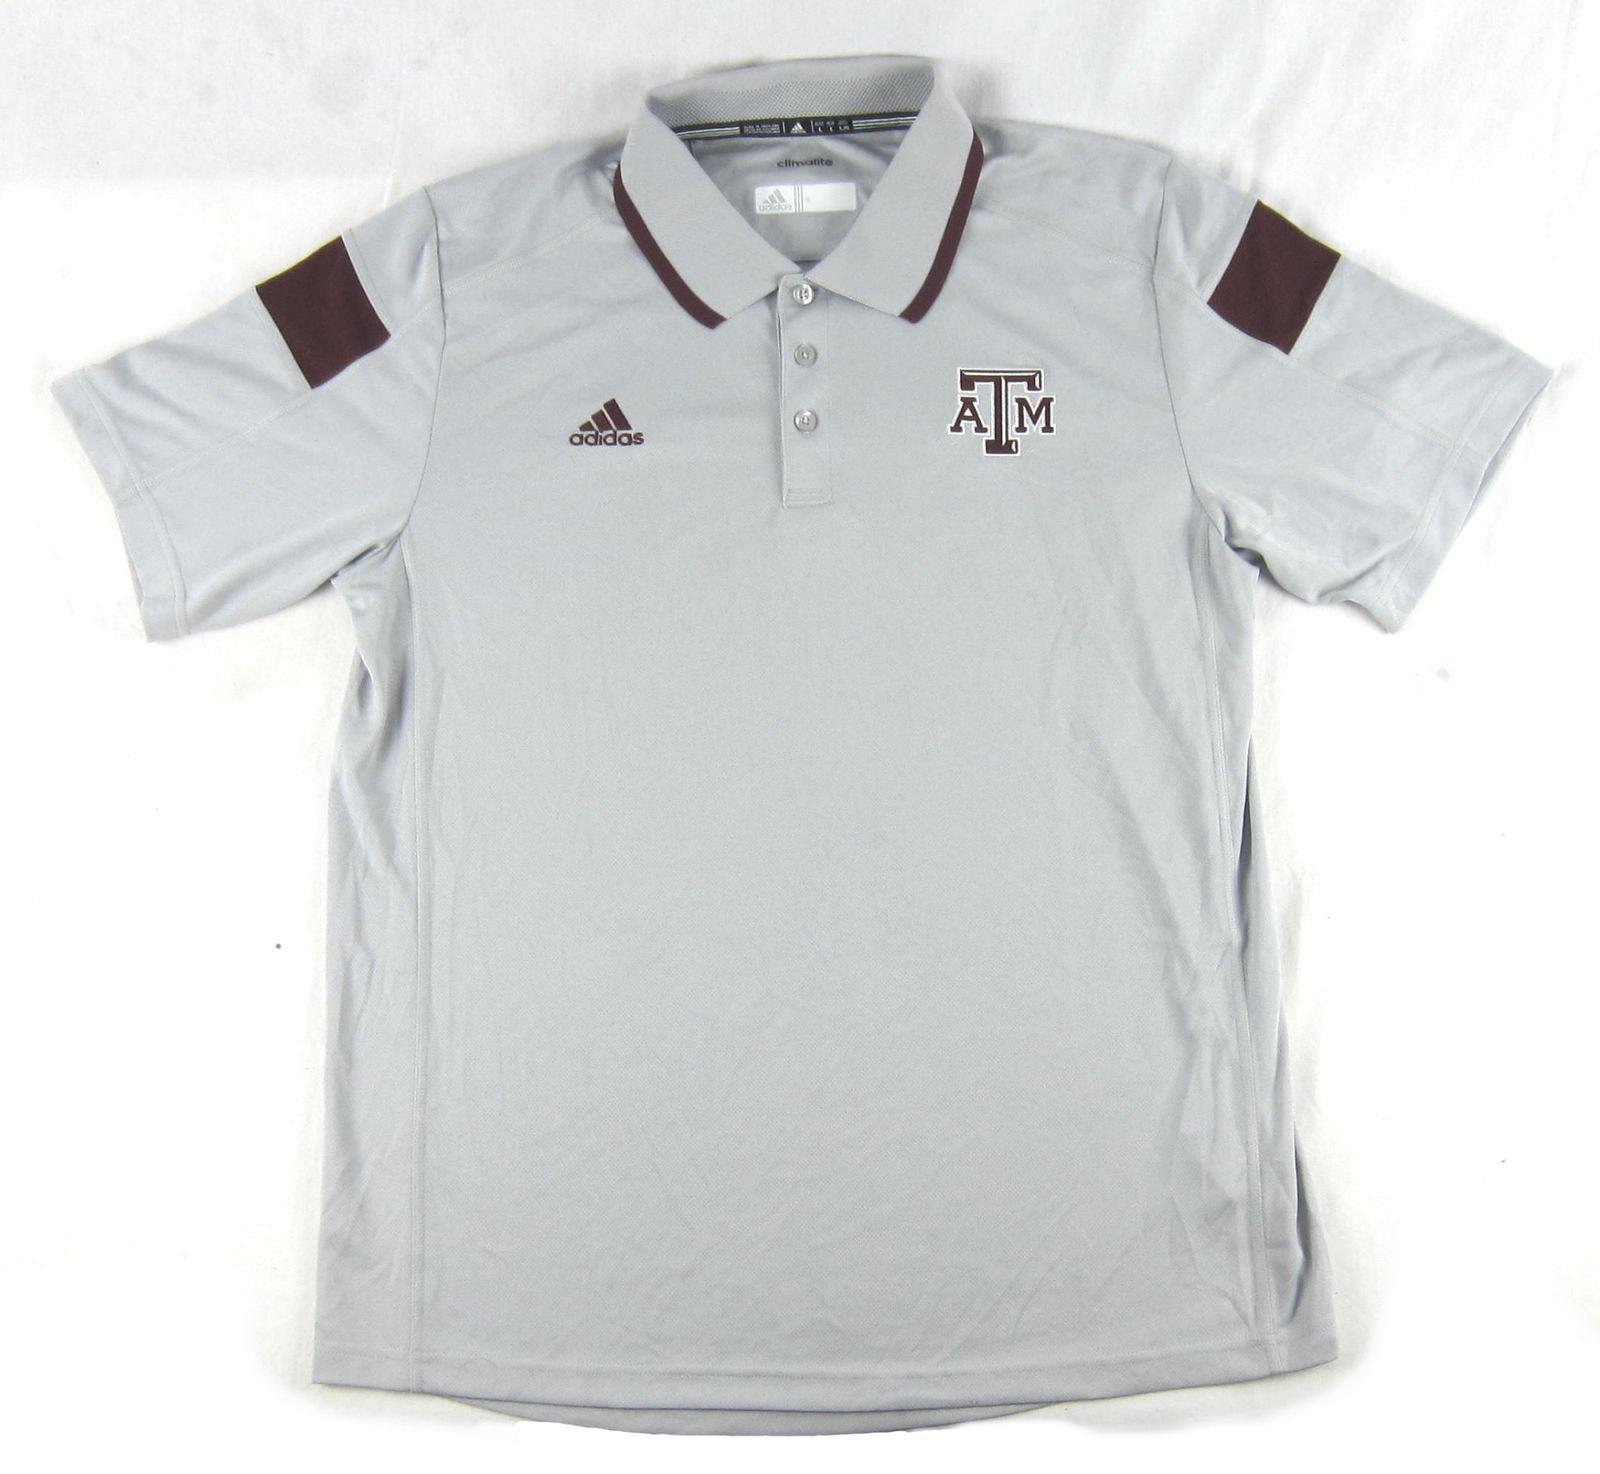 Adidas Licensed Nwt Texas Am Aggies Graymaroon Polo T Shirt